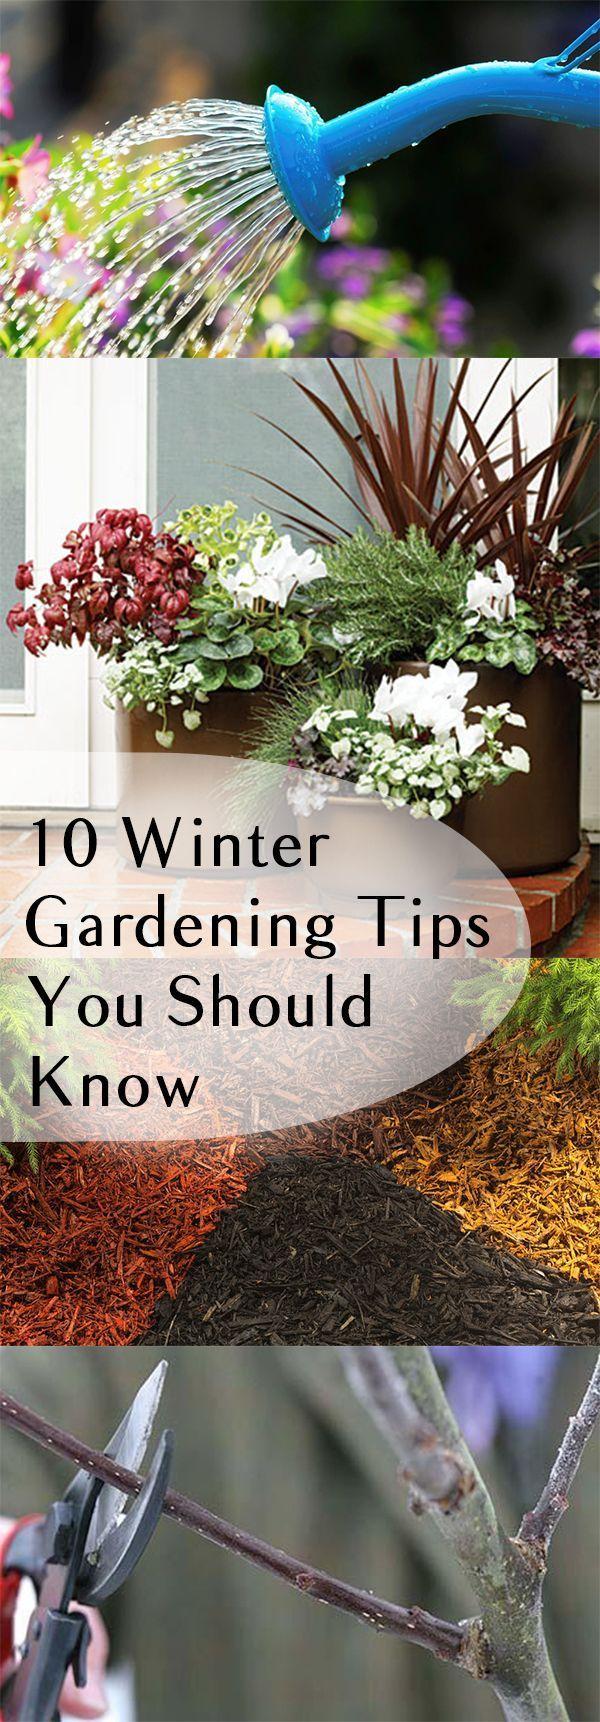 10 best winter gardening tips images on pinterest gardening